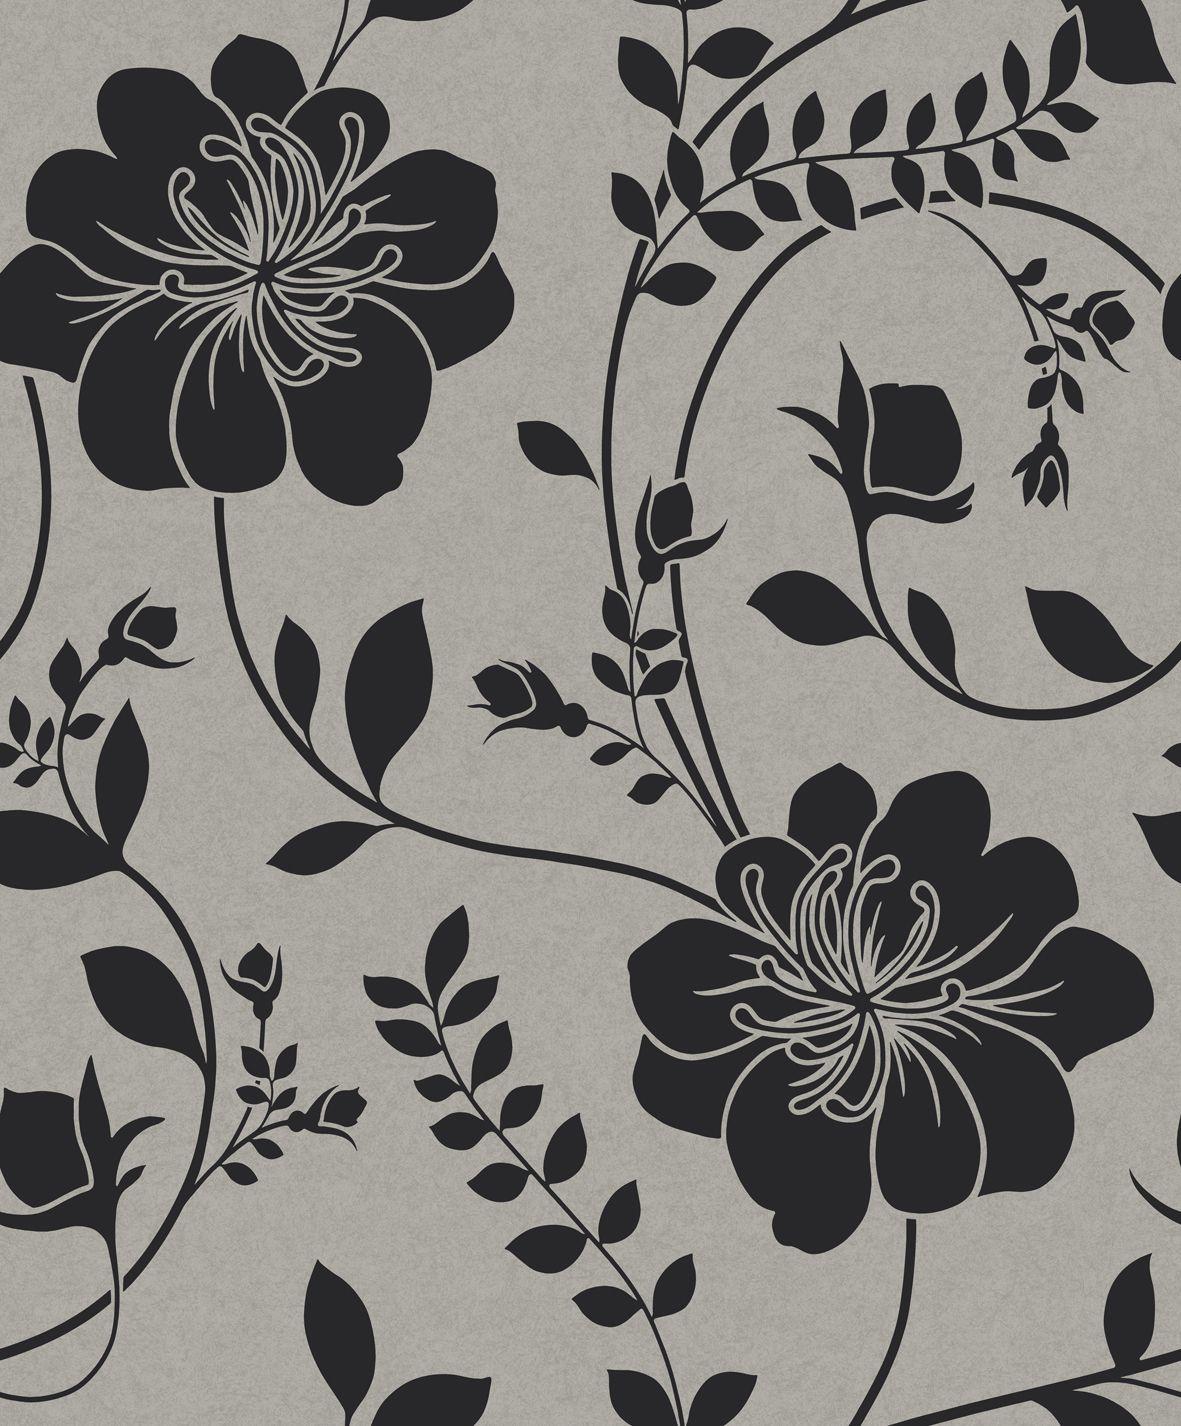 Twilight Twilight 910801 By Arthouse Wallpaper Design Pattern Wallpaper Floral Design Wallpaper